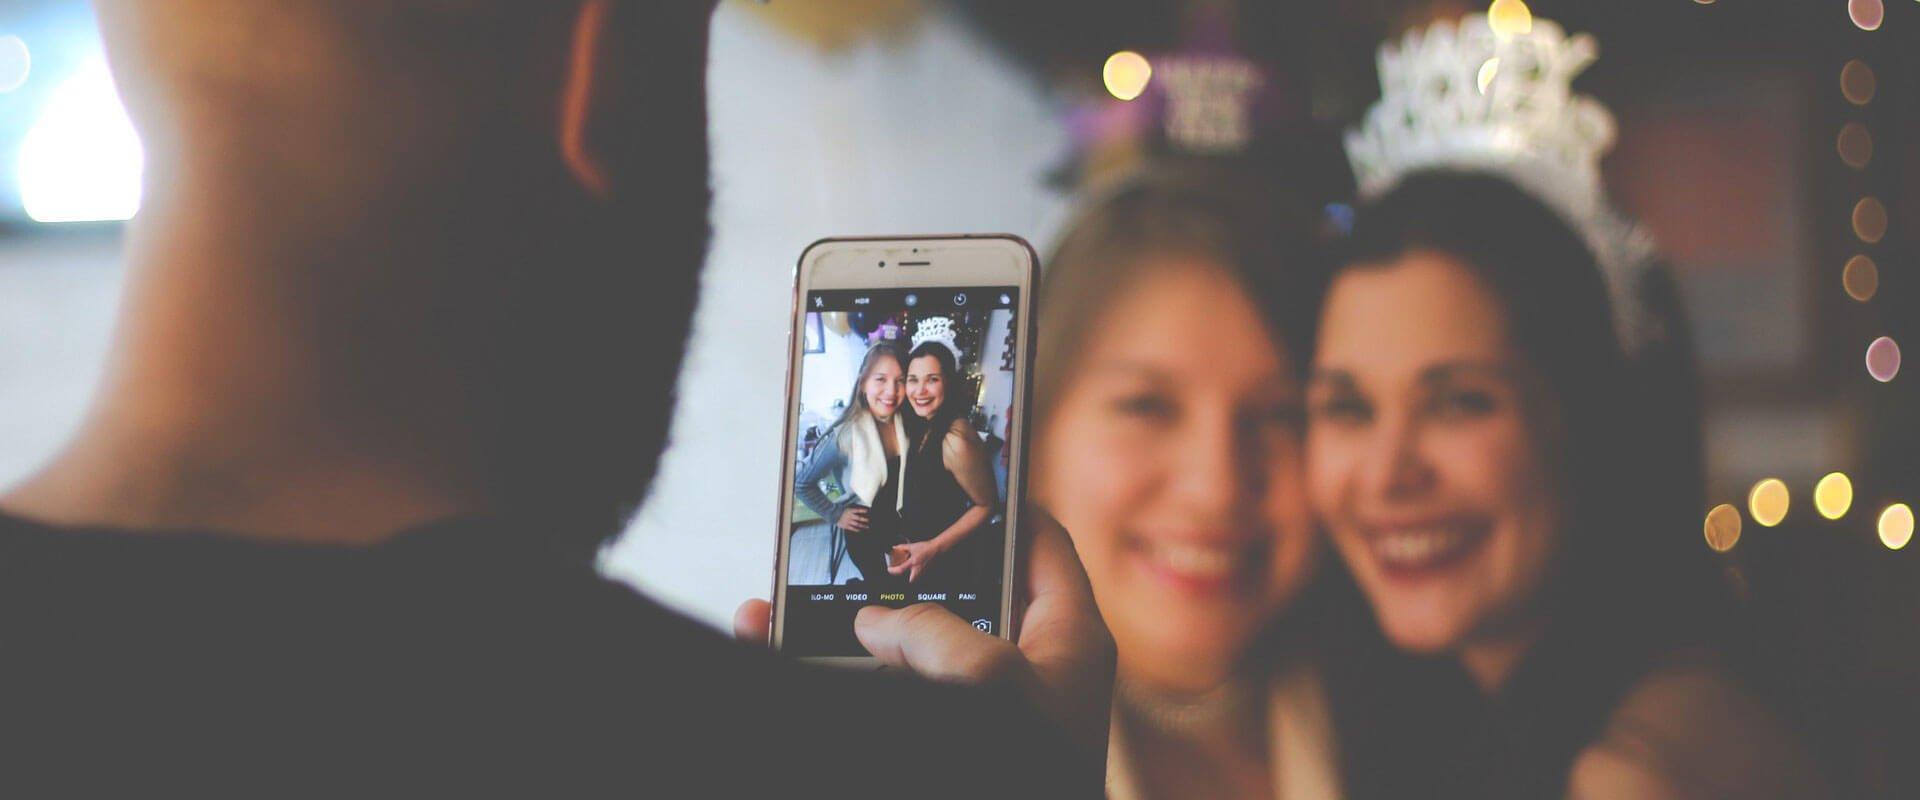 iPhone-fotos backup